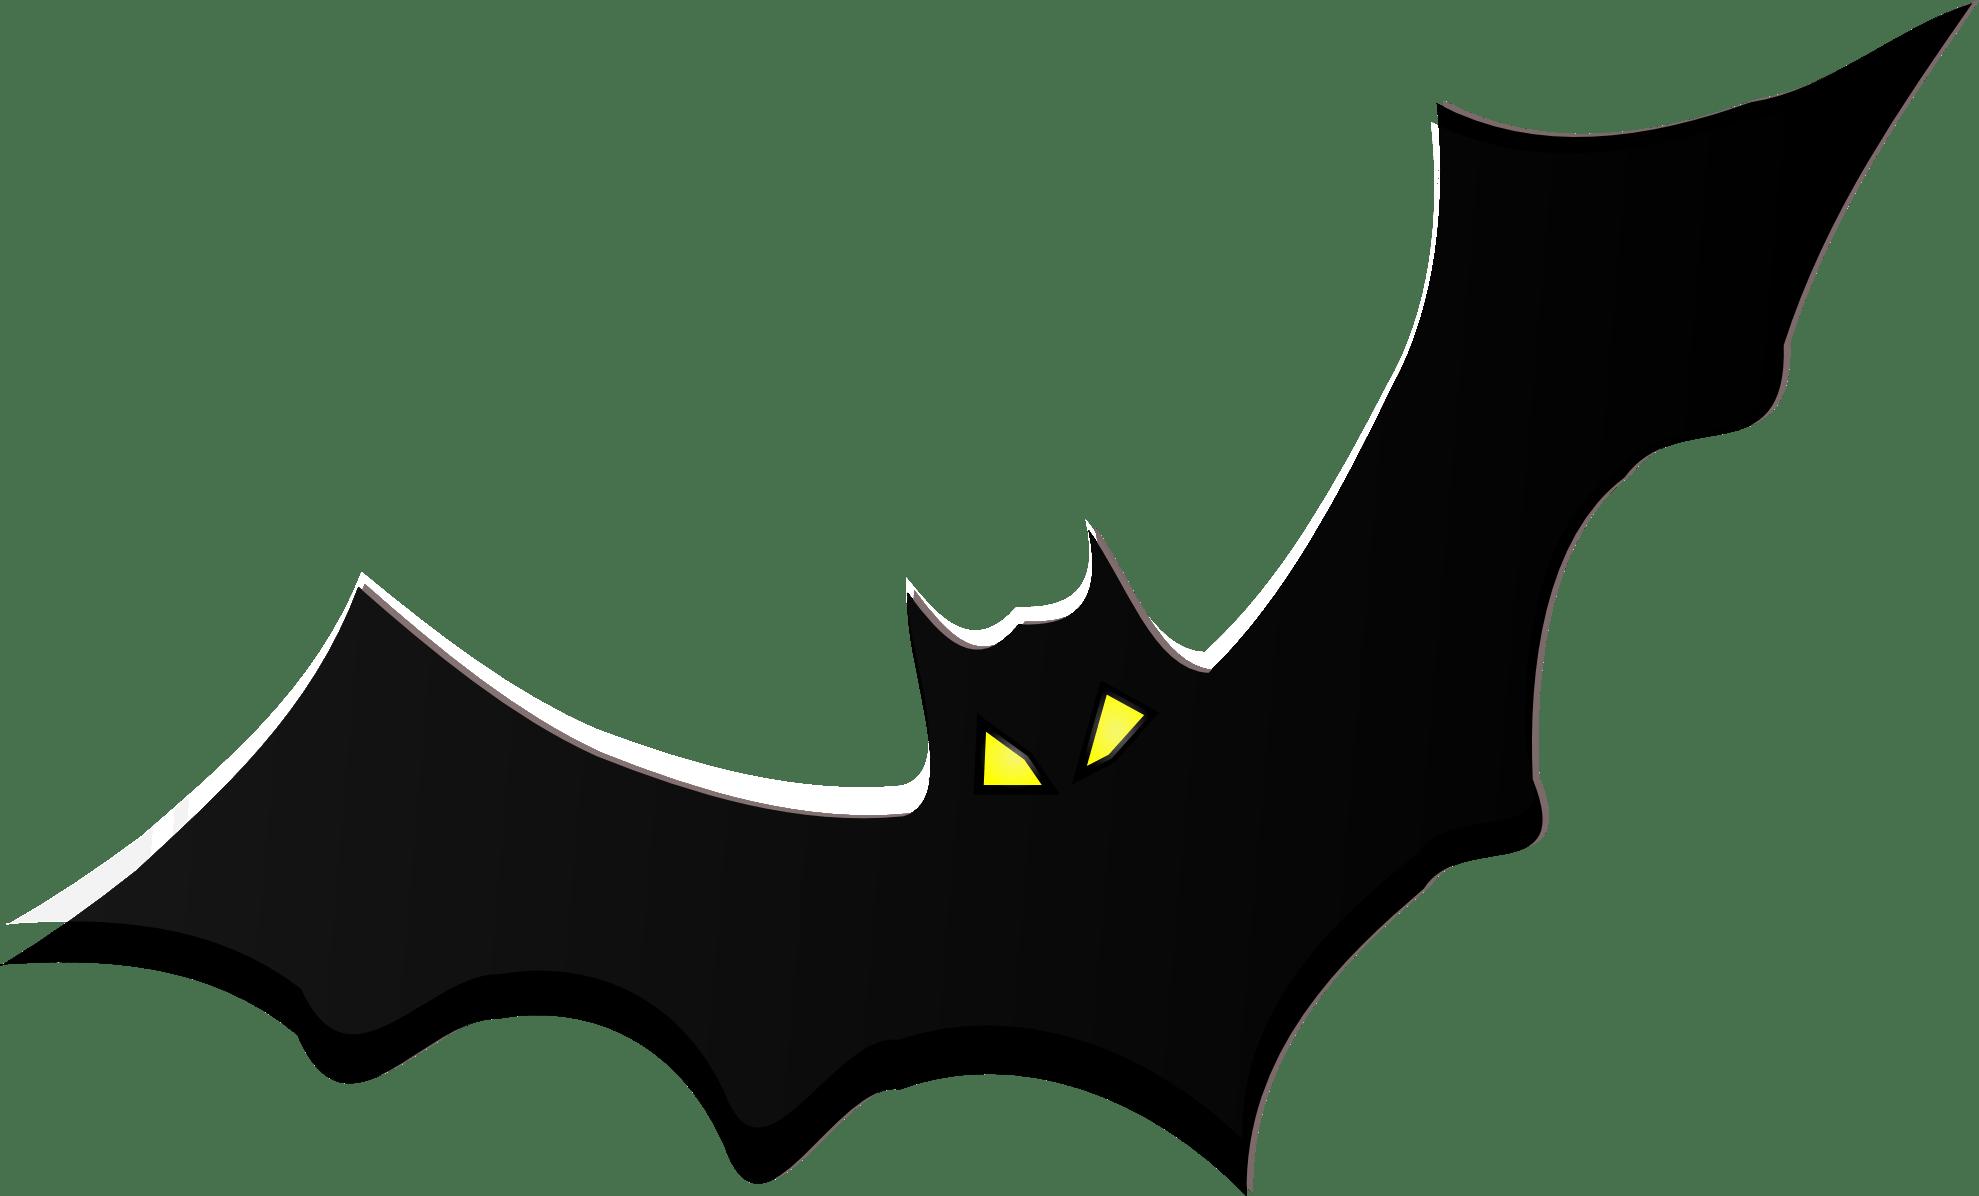 Bat transparent portal . Bats clipart clear background